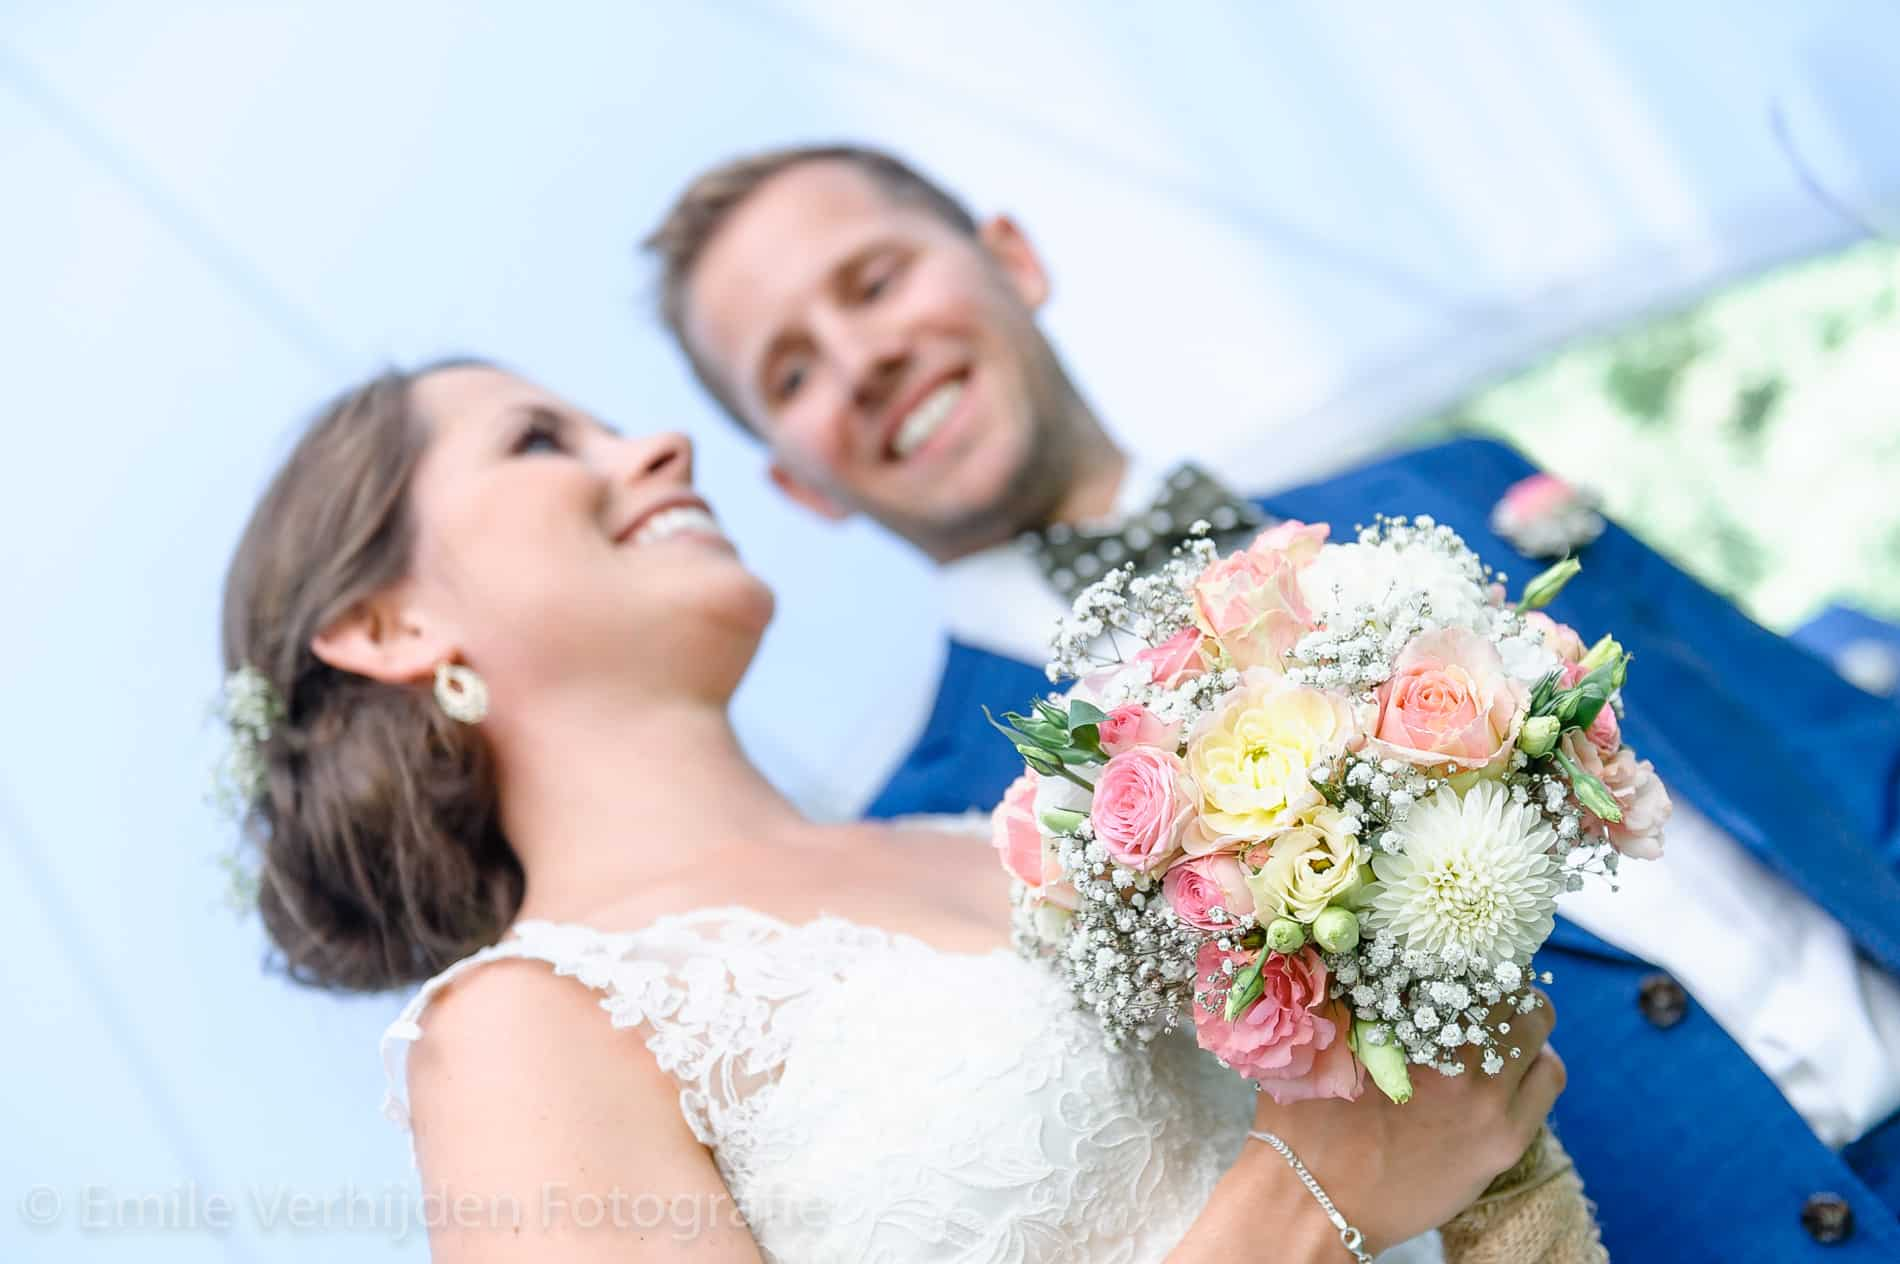 Bruidsboeket in beeld tijdens de ceremonie- Bruidsfotografie Winselerhof Landgraaf - Kerkrade